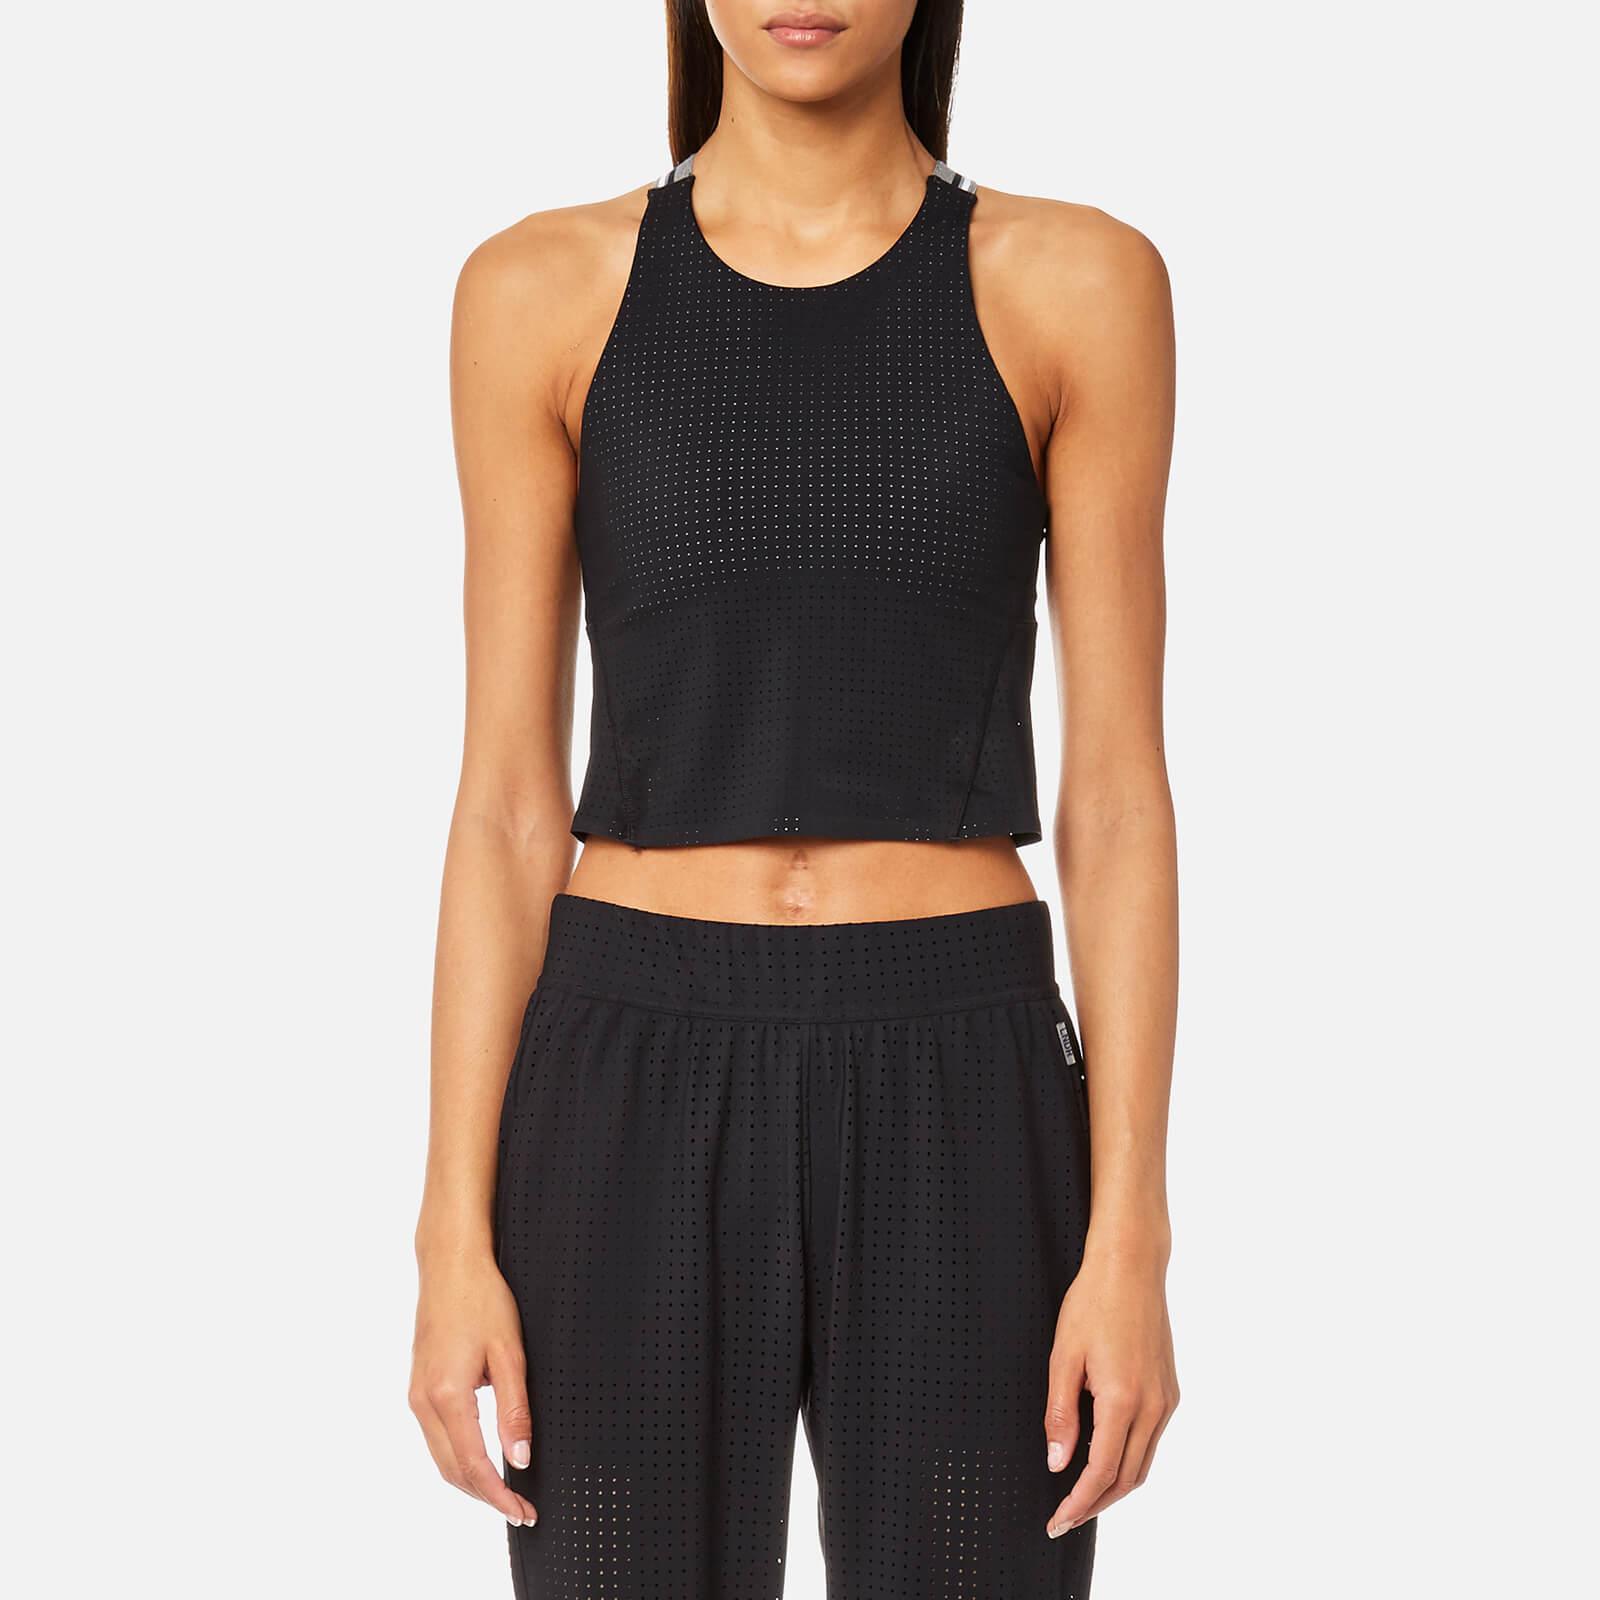 LNDR Women's Jog Crop Top - Black